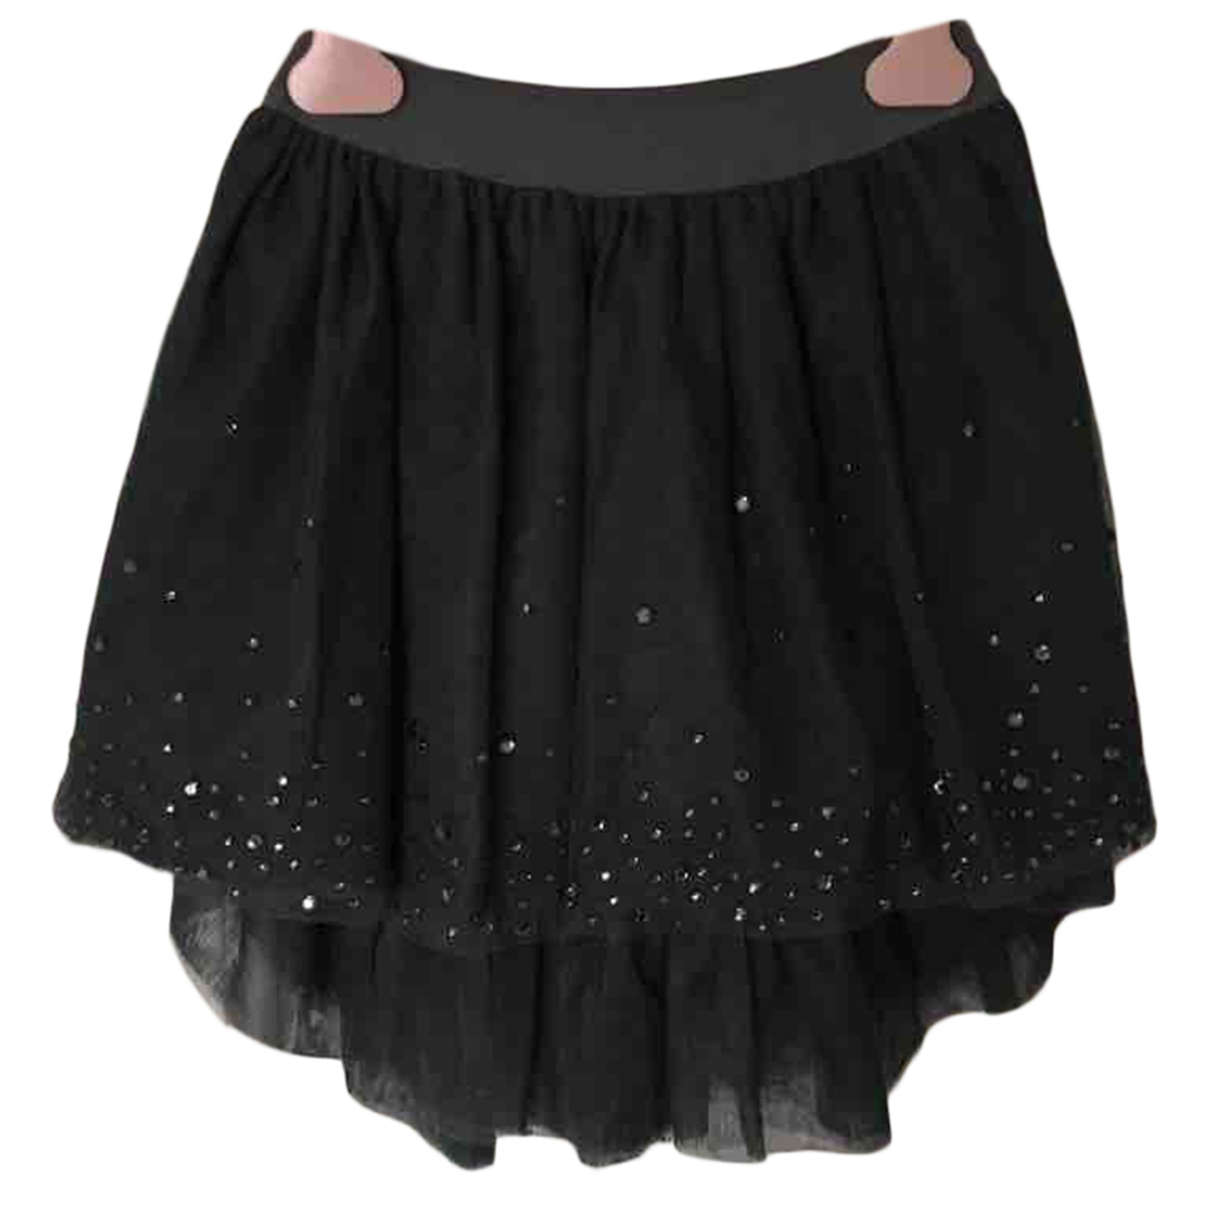 Blumarine \N Grey skirt for Kids 6 years - up to 114cm FR